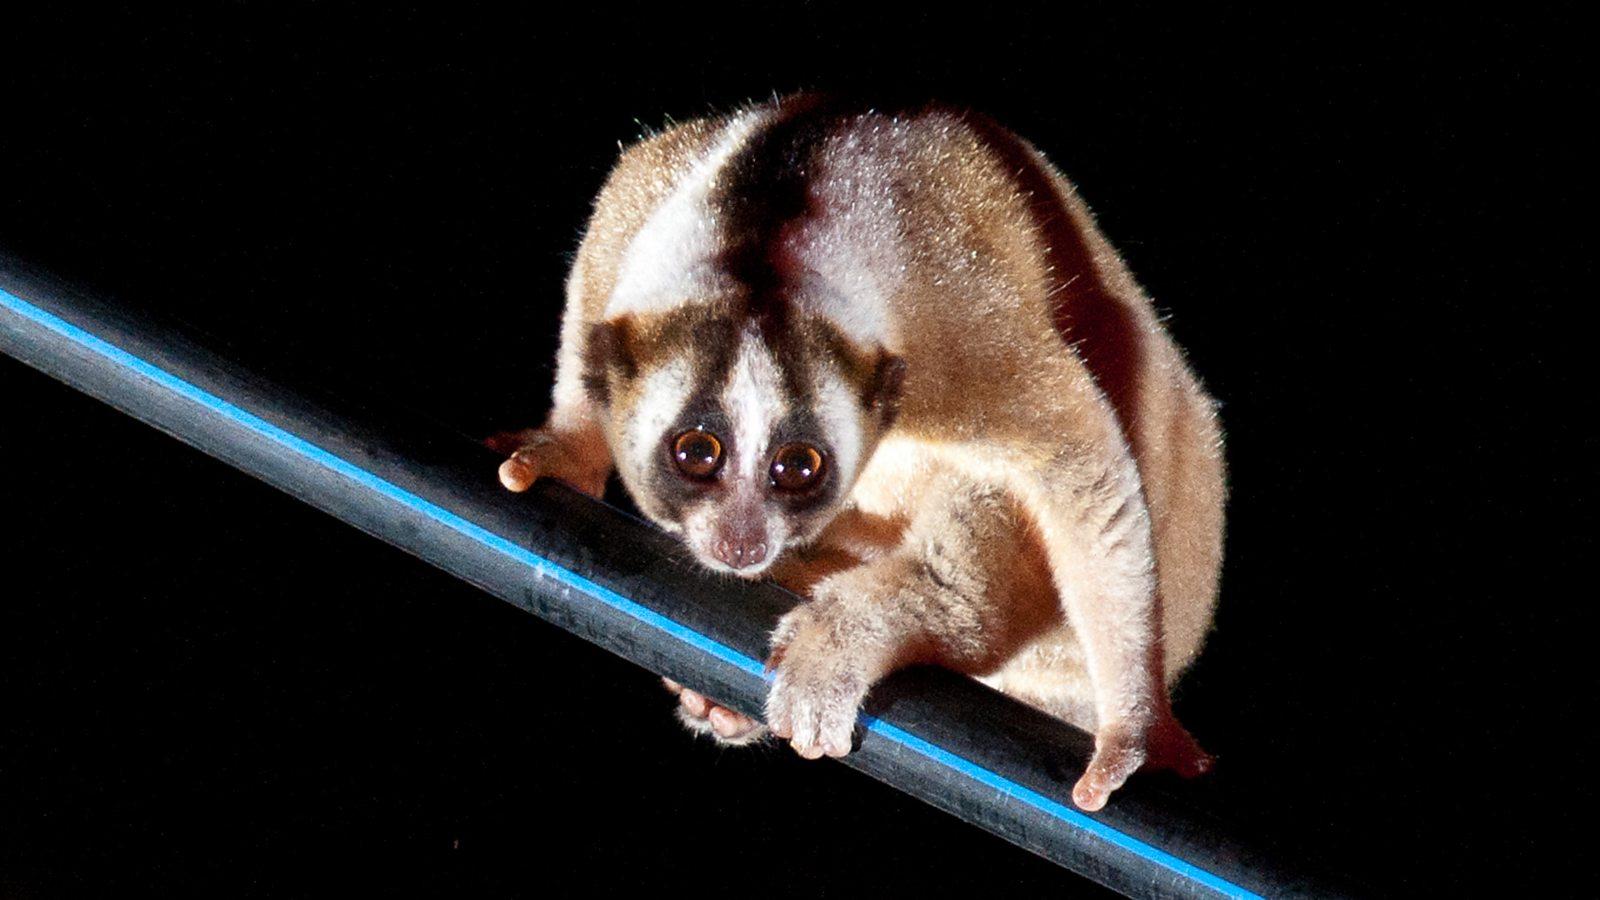 The mid-air walkways saving endangered animals